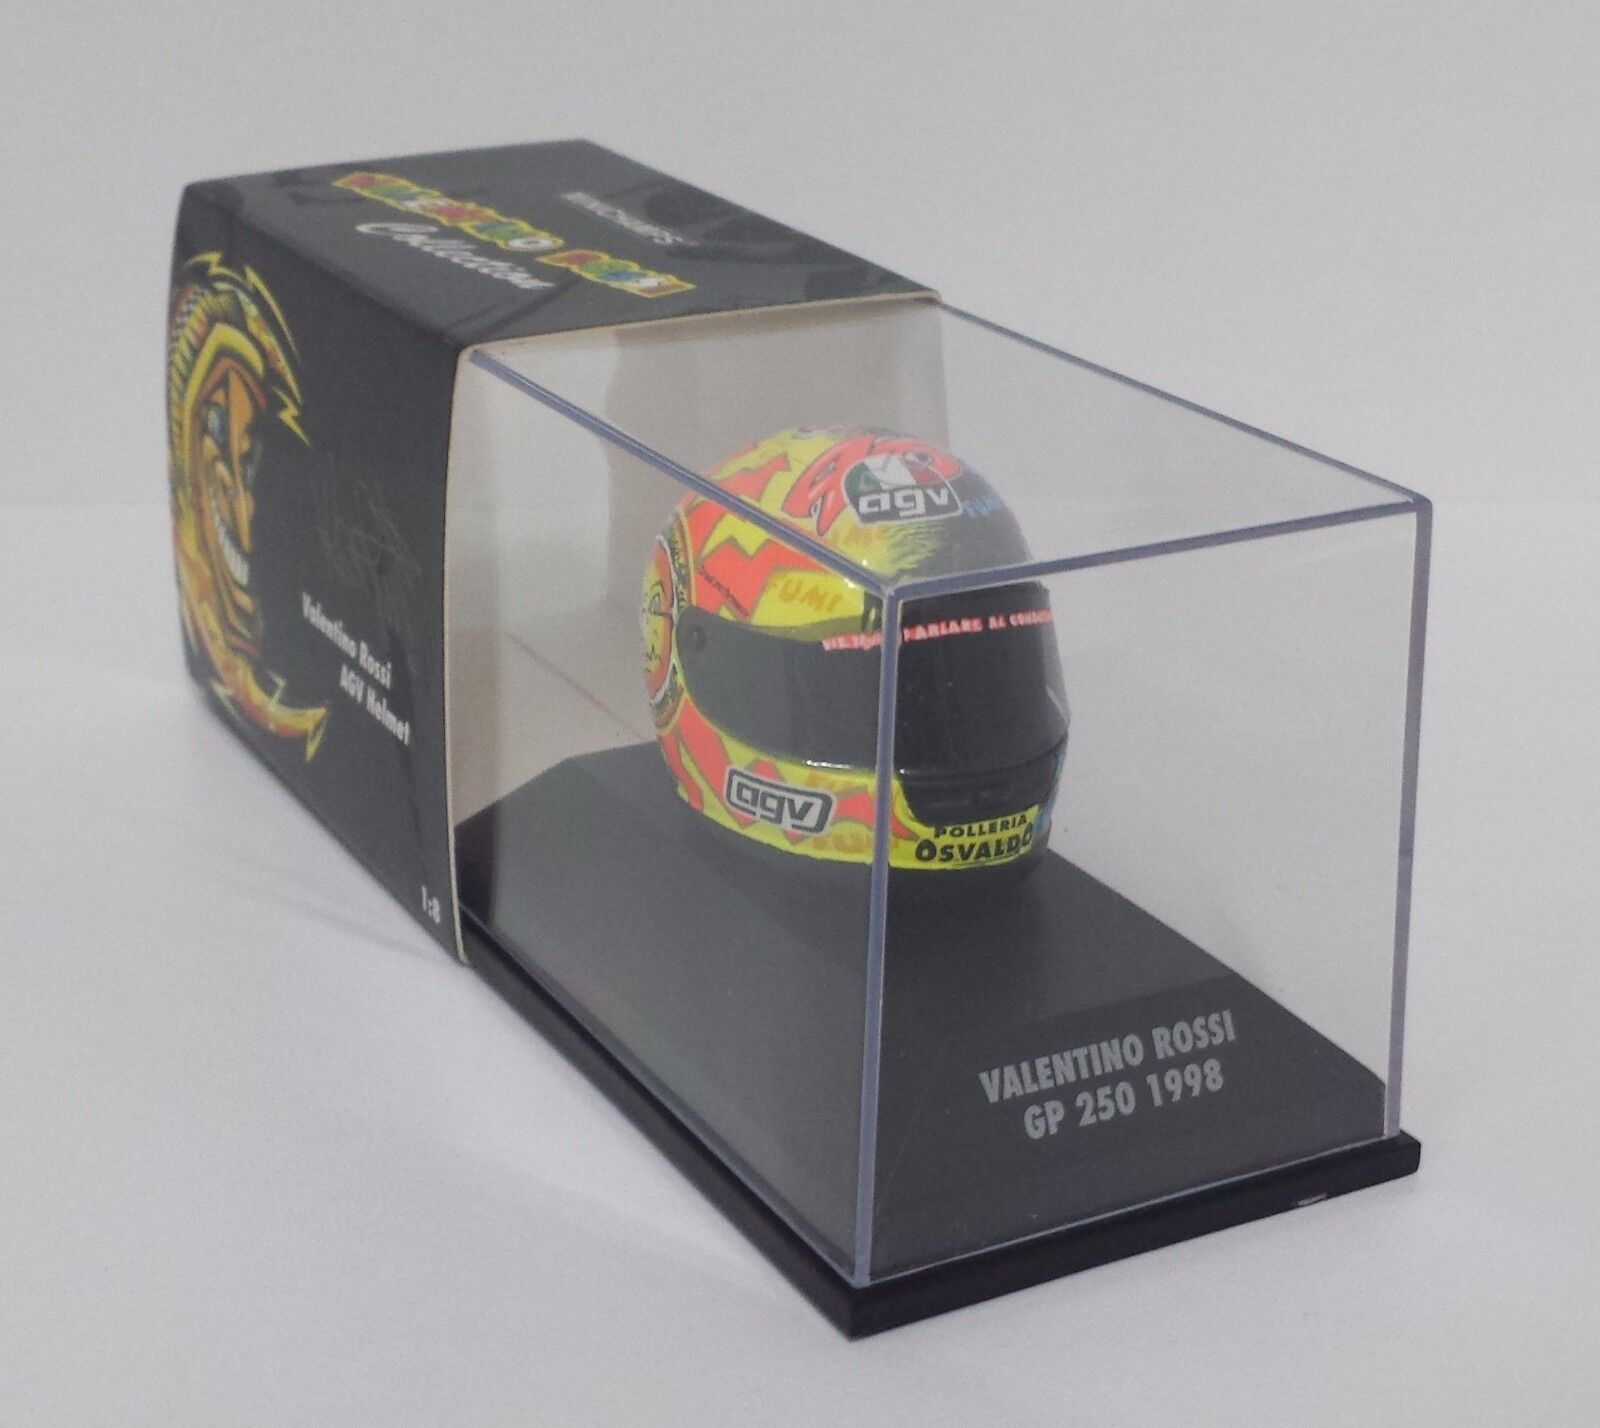 MINICHAMPS VALENTINO ROSSI MODÈLE AGV CASQUE HELMET 1 8 MOTO GP 250 1998 NEW